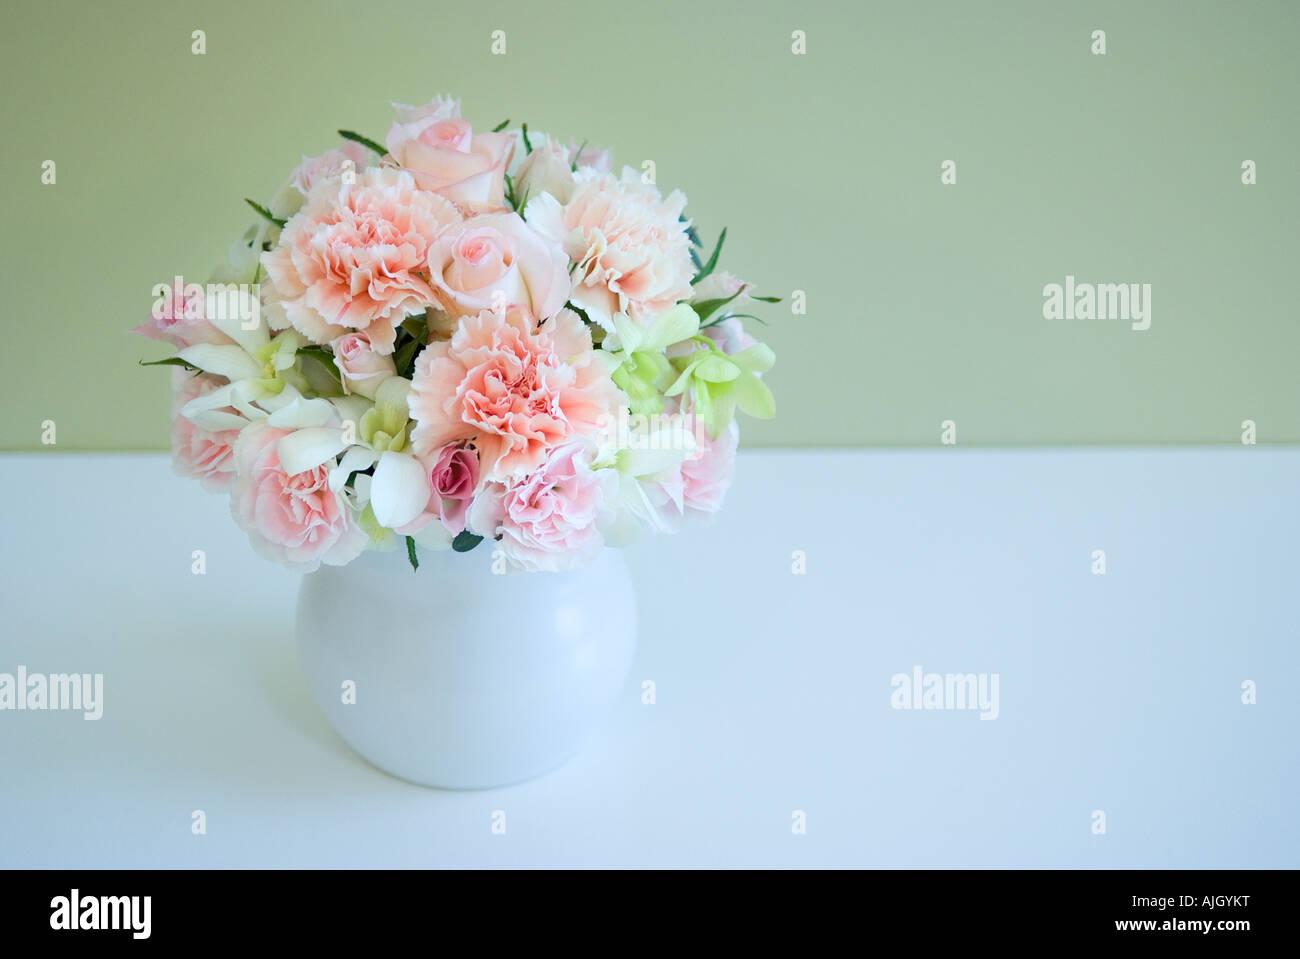 Carnations in vase - Stock Image